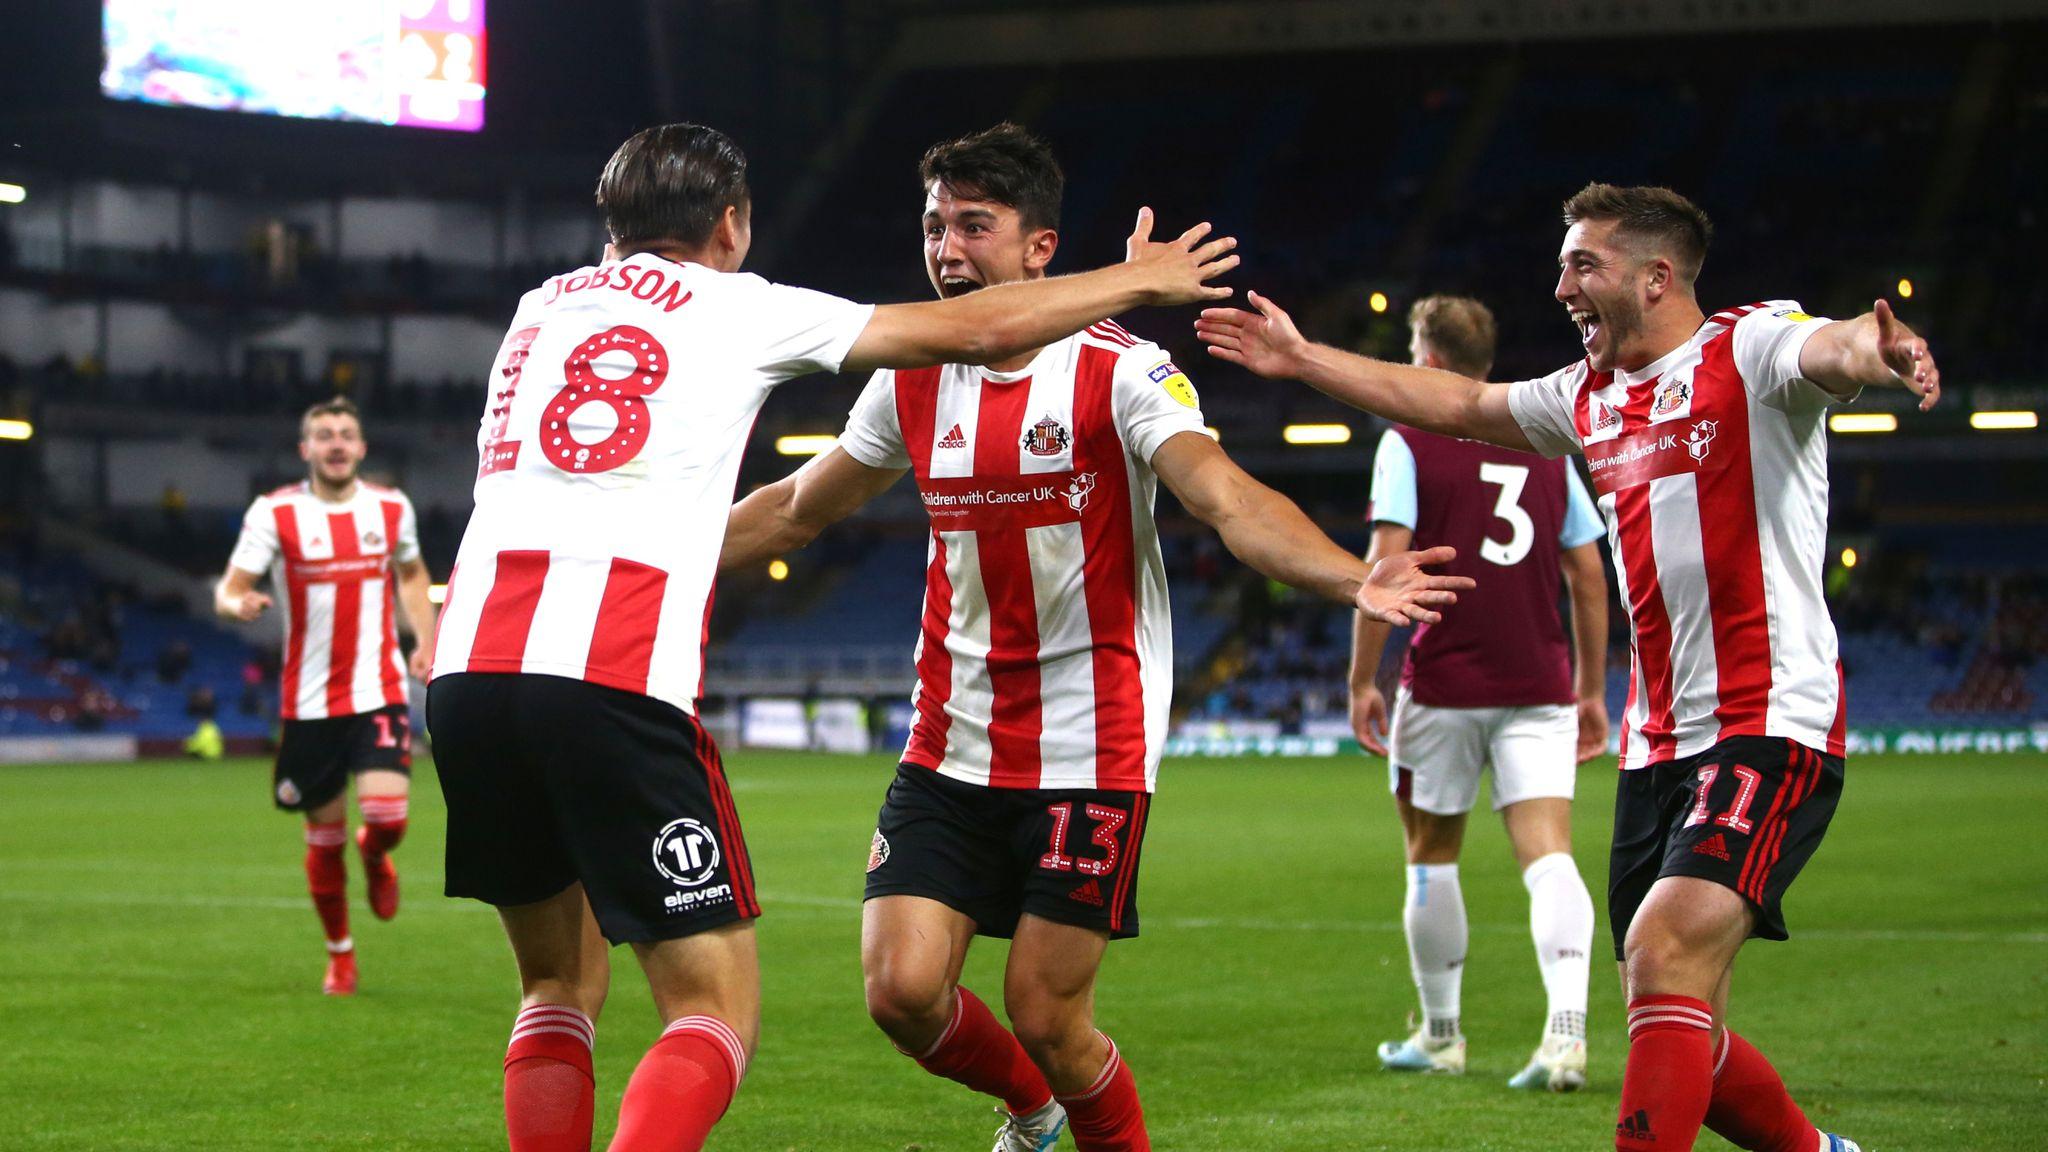 What next for Sunderland after Jack Ross sacking?